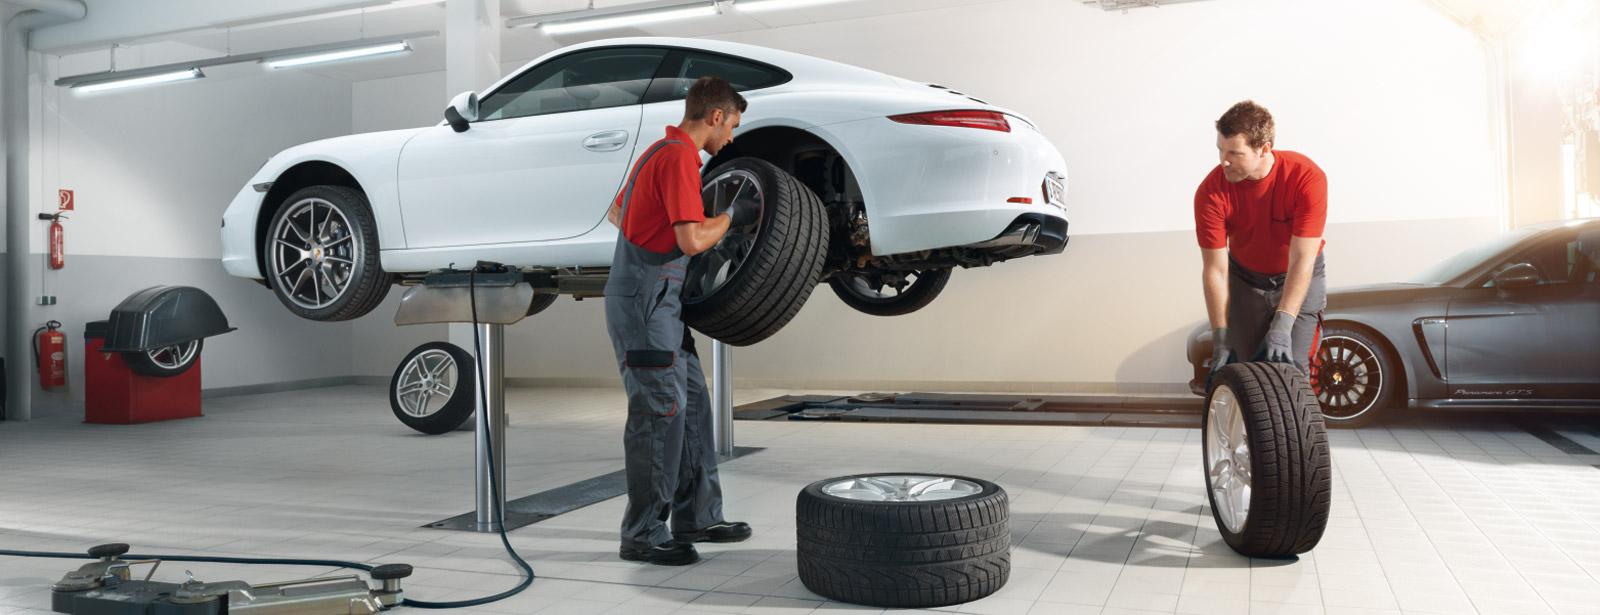 Epic Repair a Car